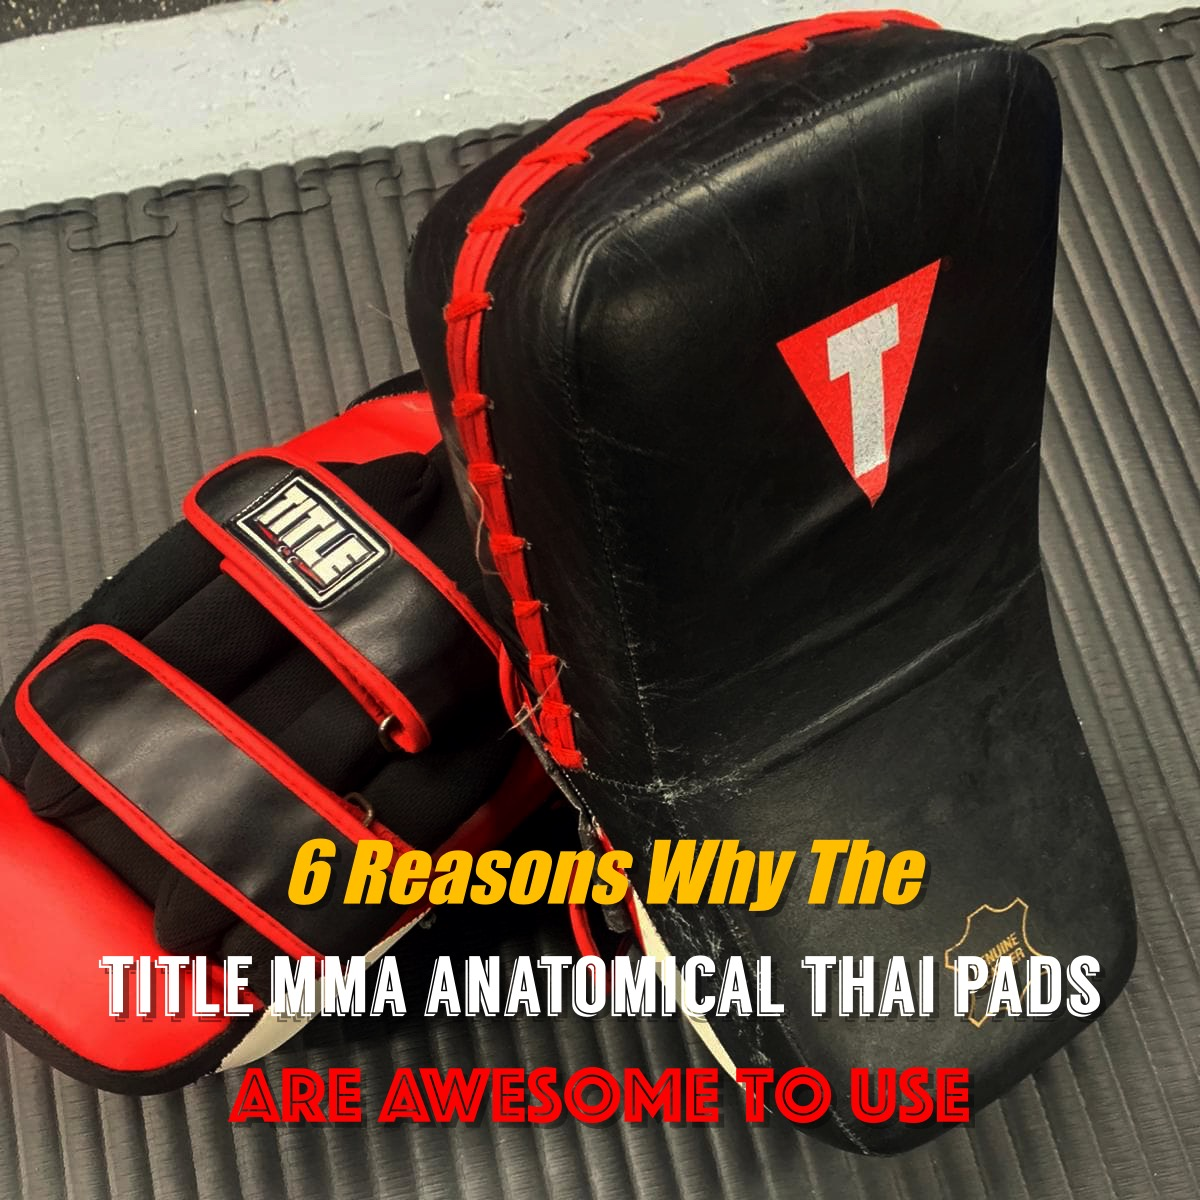 Title MMA Anatomical Thai Pads